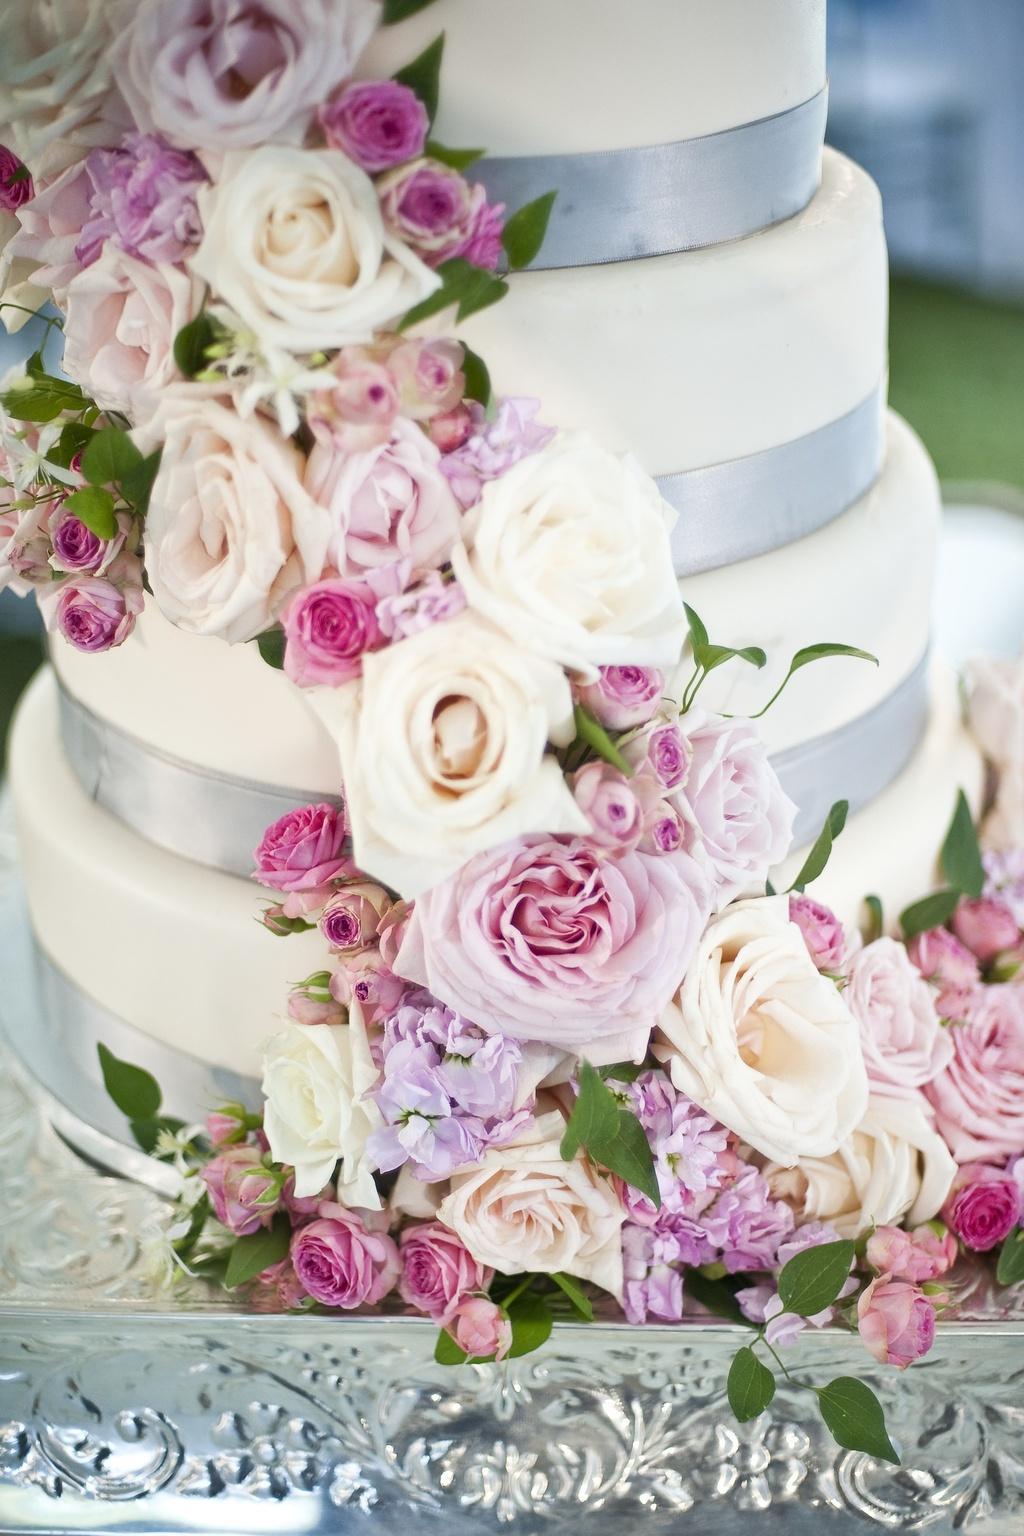 Romantic-wedding-cake-with-cascading-roses.full